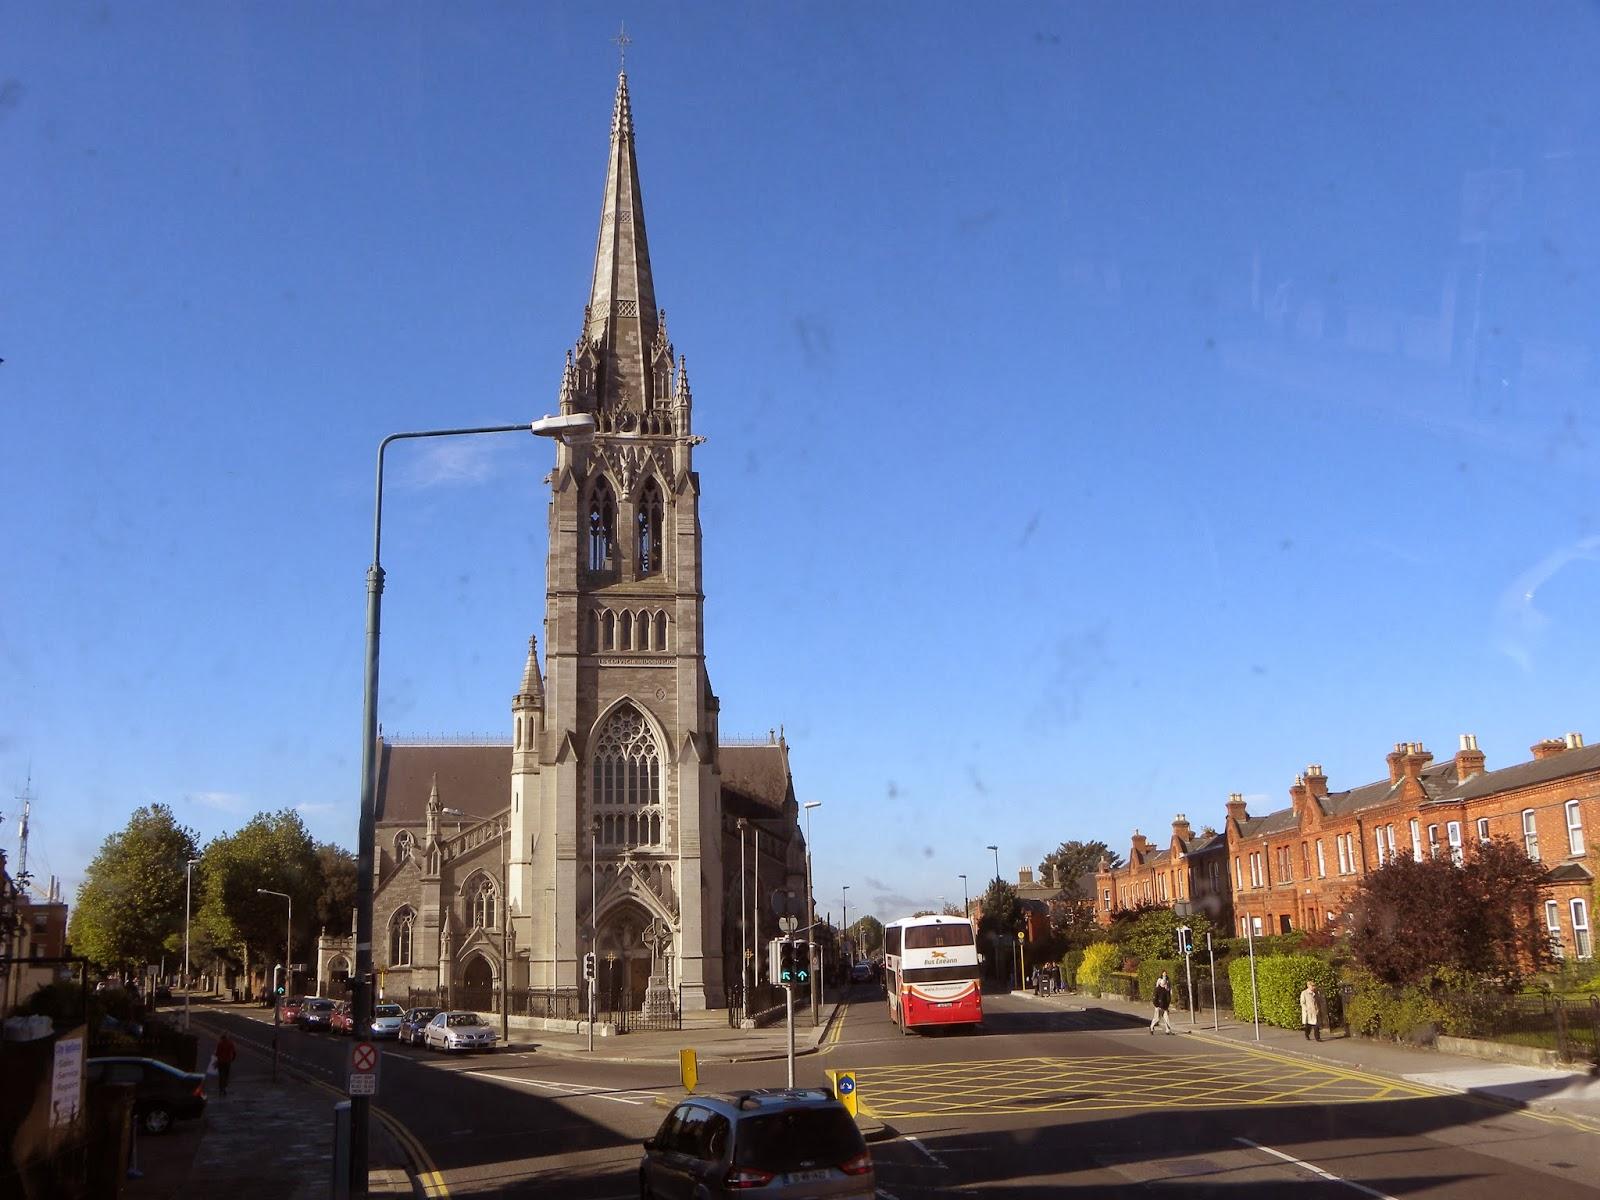 St. Peter's Church. Guia de viaje de Dublín. Tu Maleta.